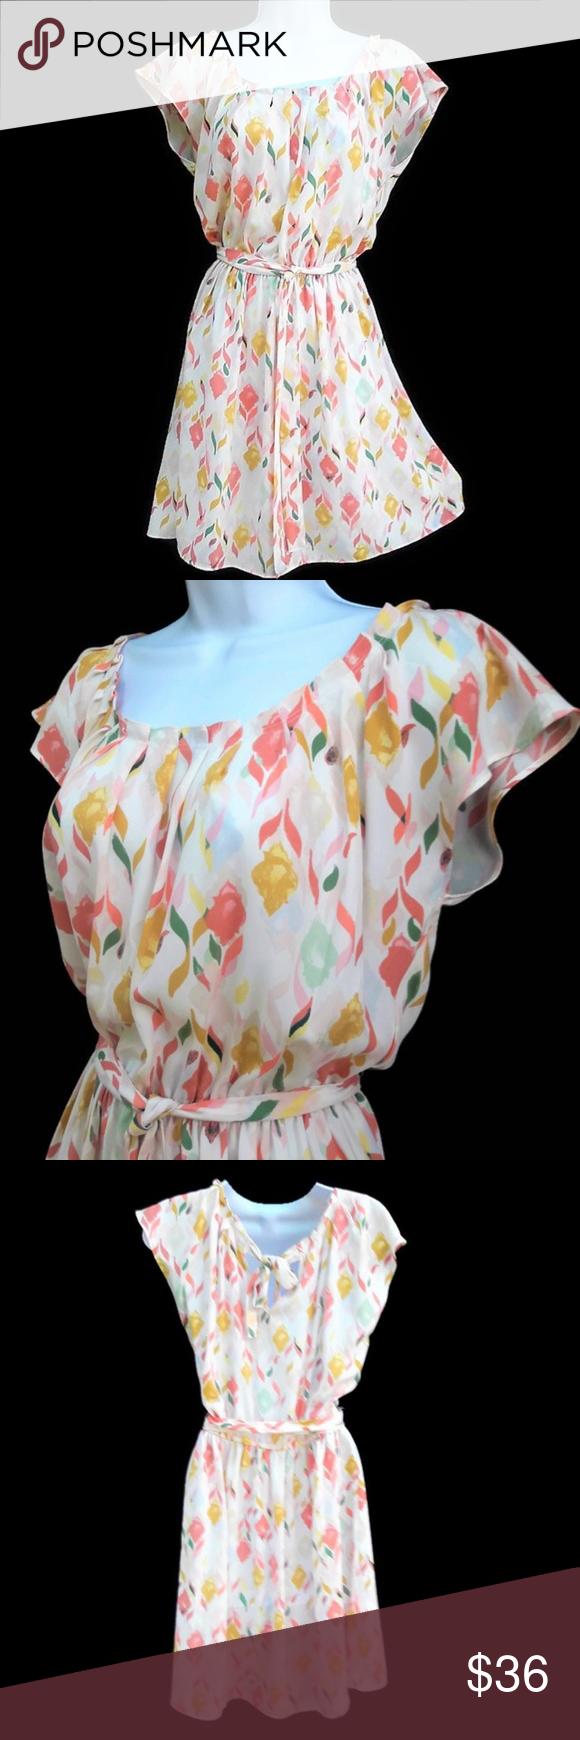 LC Lauren Conrad Dress Spring Pintuck Neckline S LC Lauren Conrad Dress Spring Pin-tuck Neckline. Back Keyhole Tie. Pastels Cream Orange, Yellow, Green. Machine Wash. Tagged size S.  Bust: 22